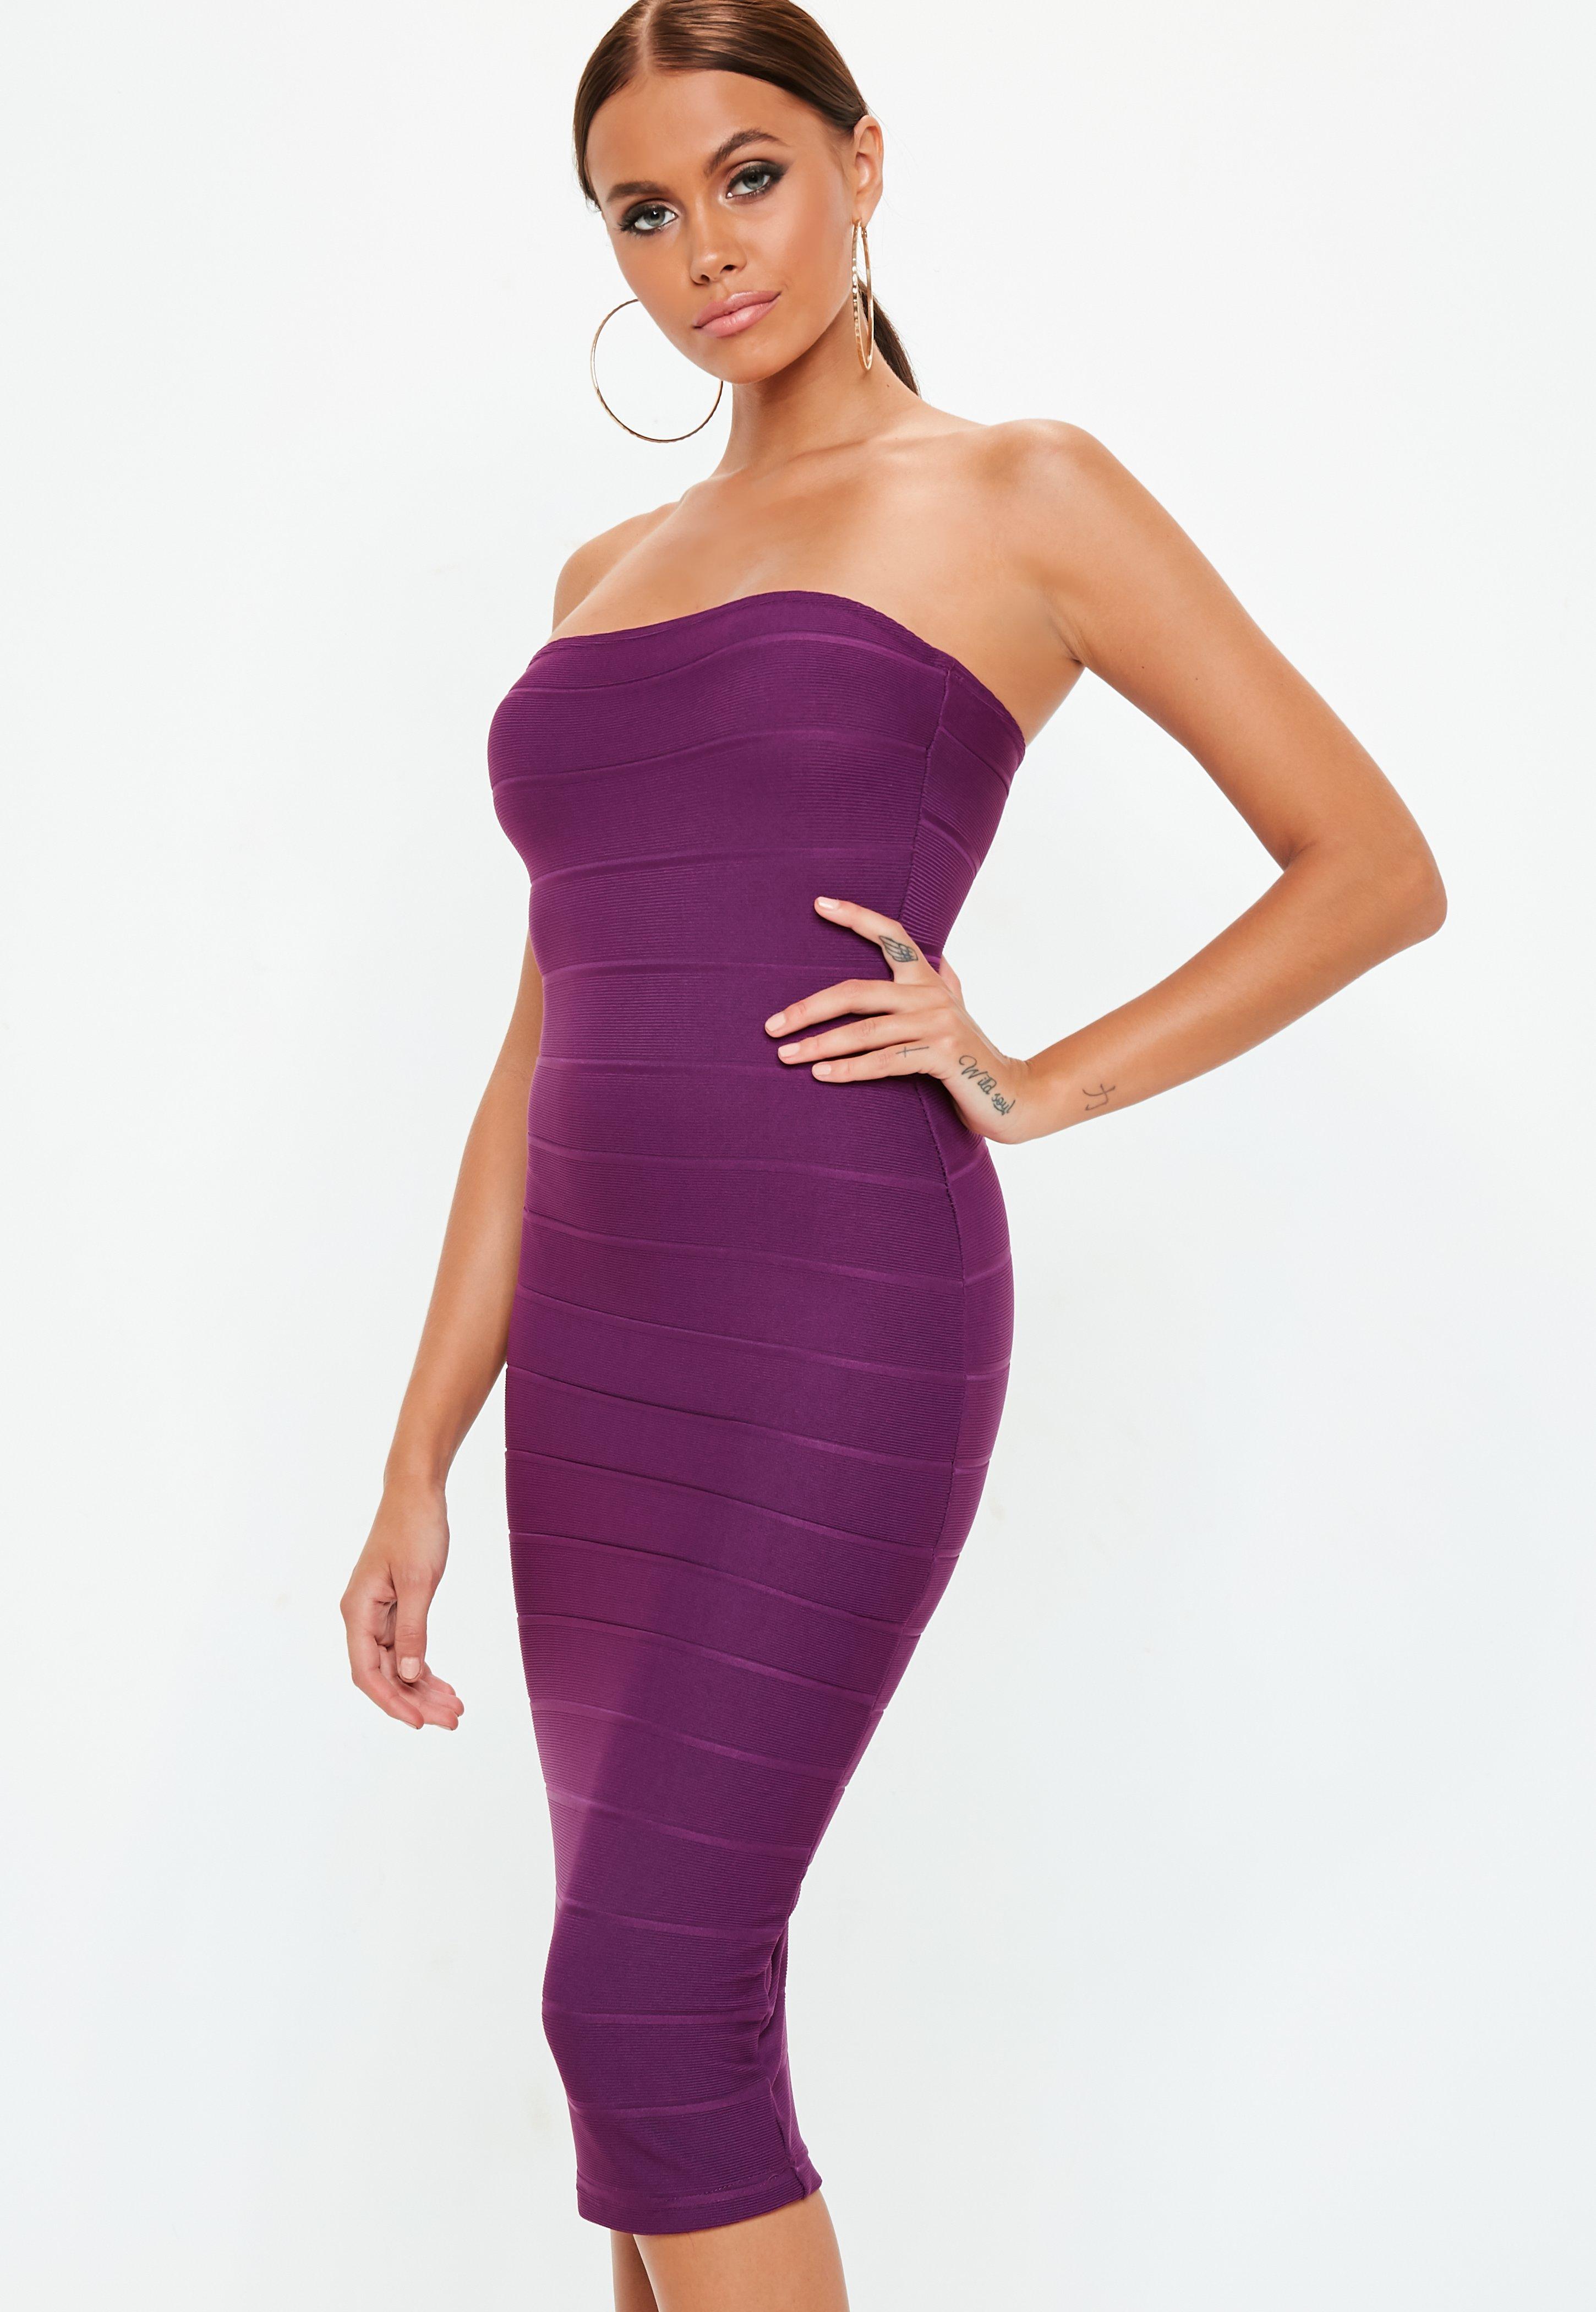 Bandeau Dresses | Shop Strapless Dresses - Missguided